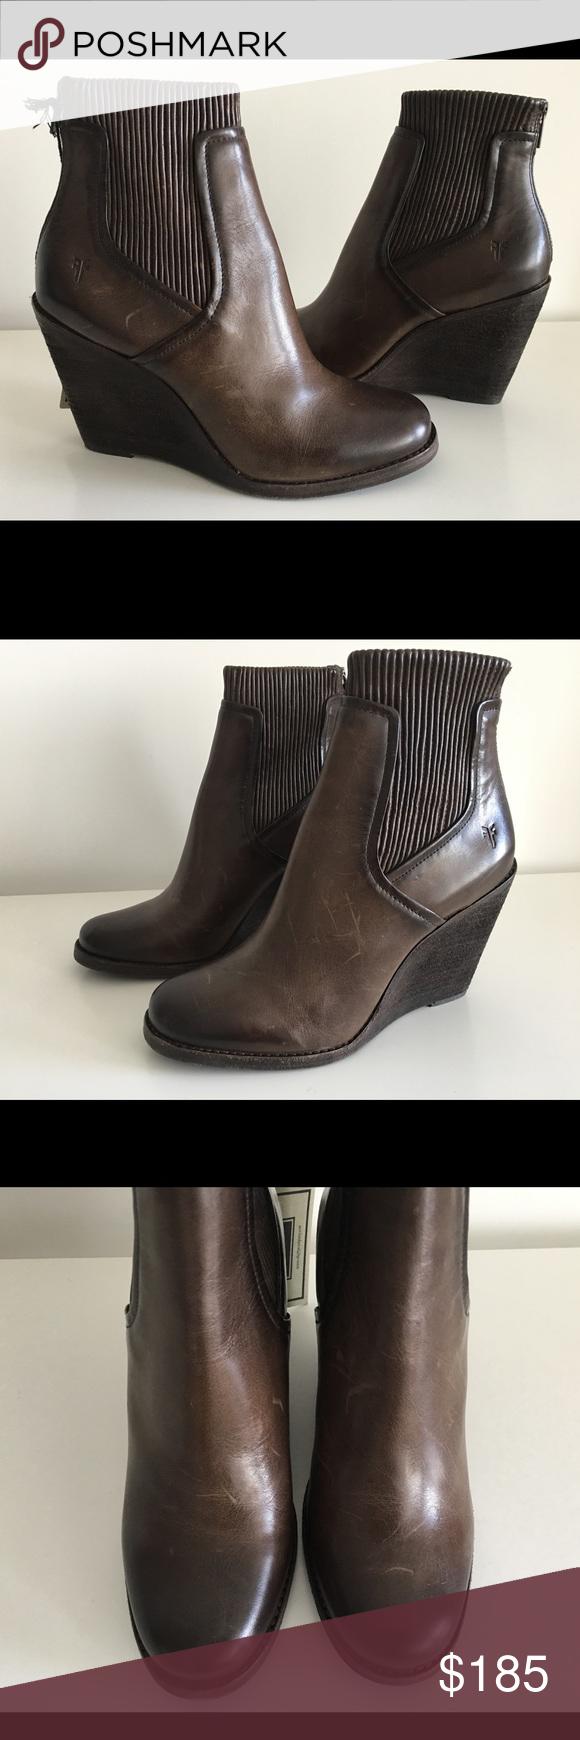 60fefdf22c9a Frye womens carrie scrunch back zip boot